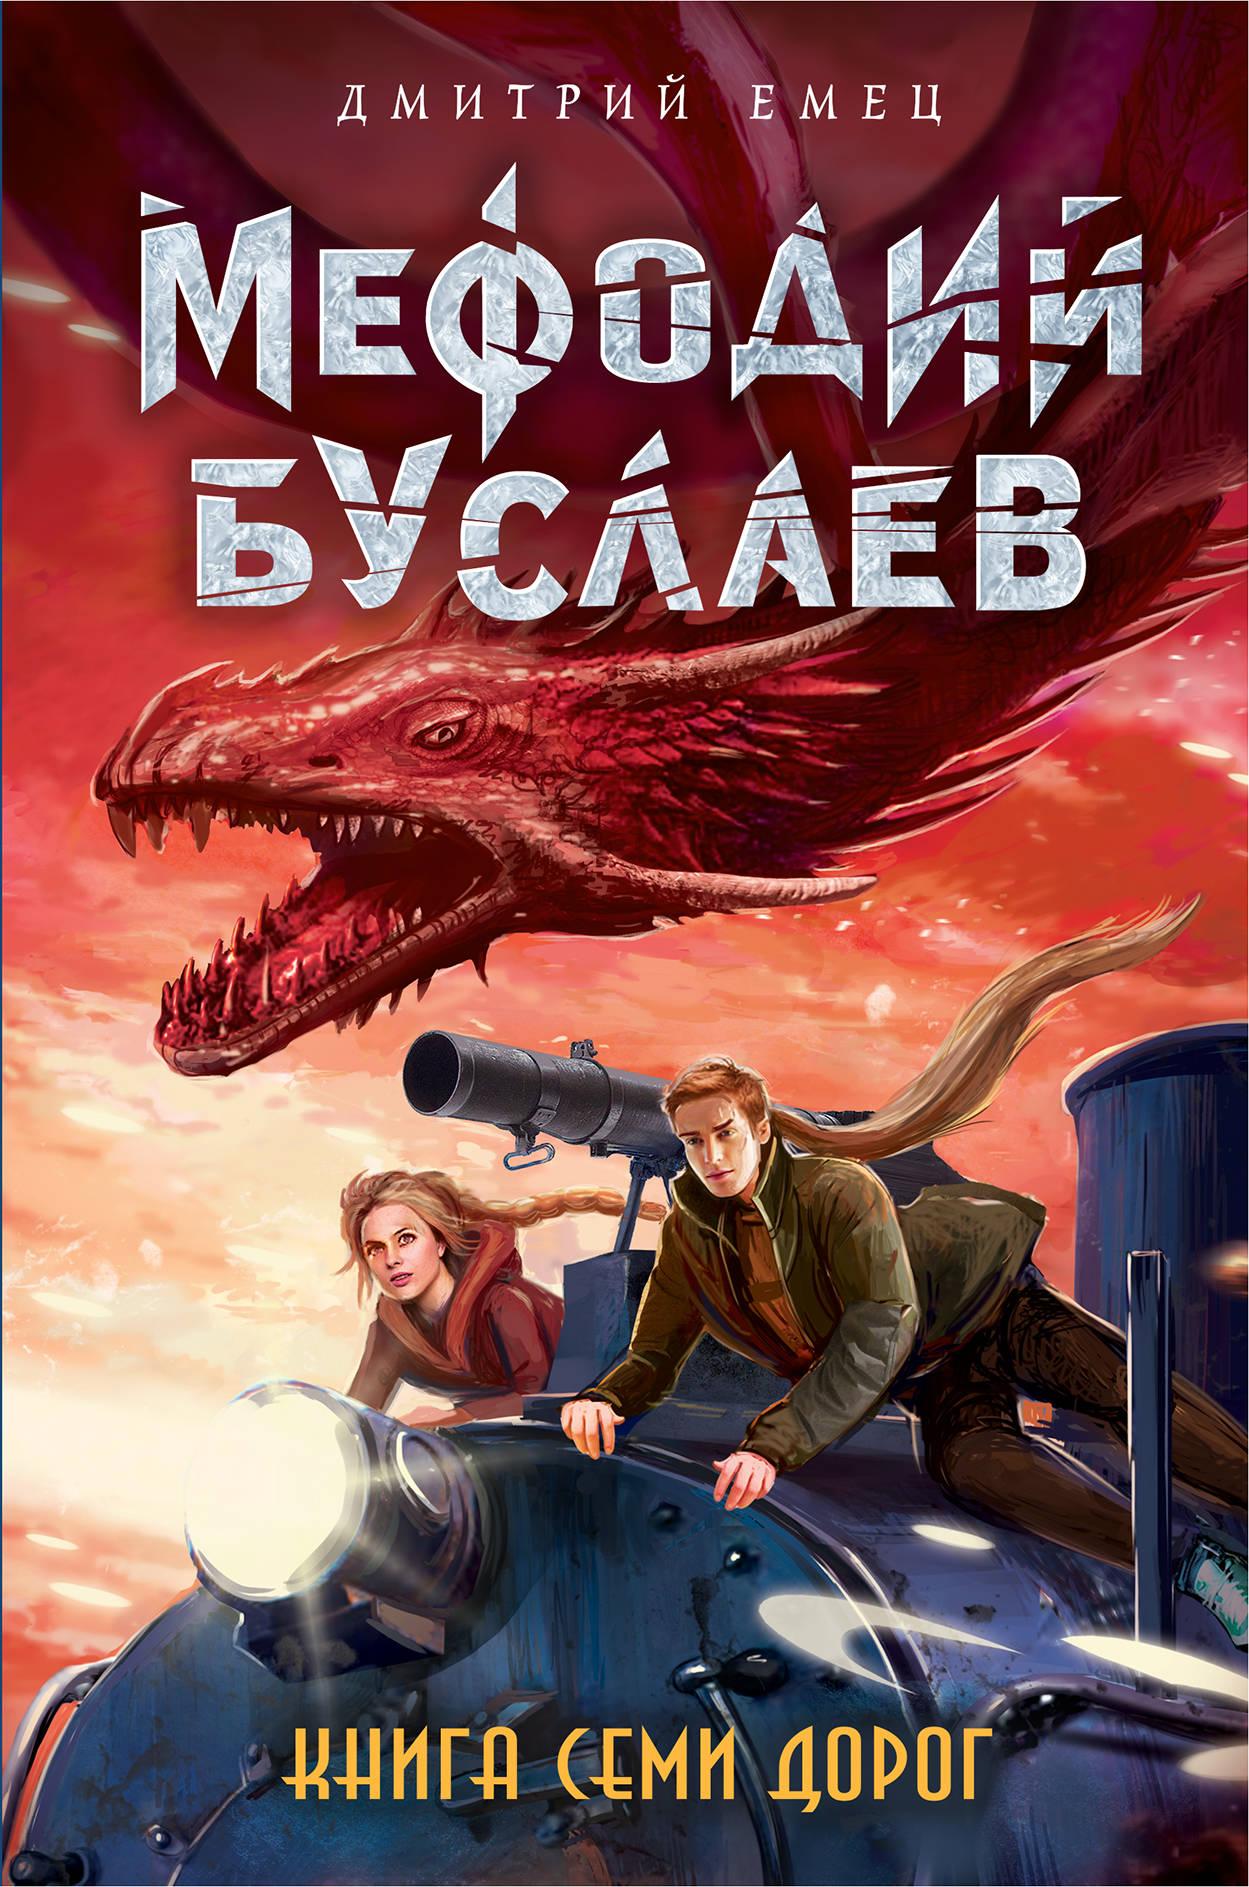 Дмитрий Емец. Книга Семи Дорог